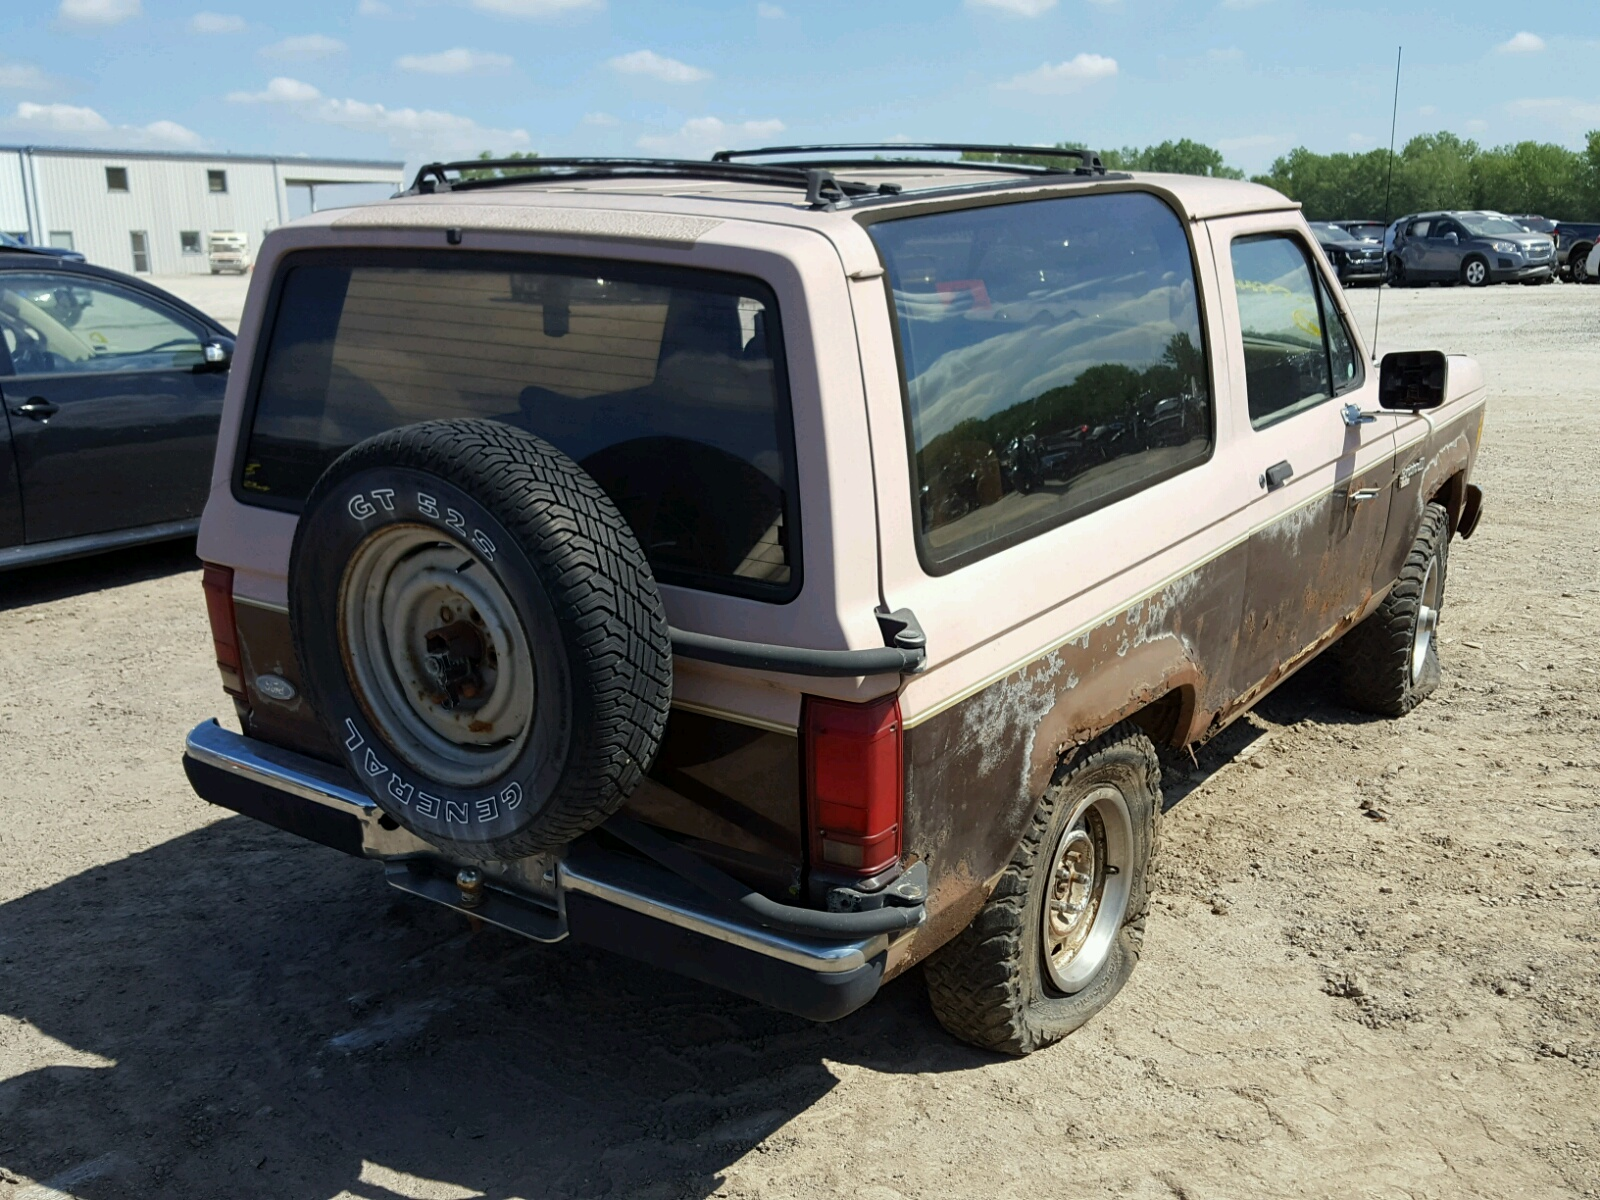 1fmcu14t1huc99445 1987 Brown Ford Bronco Ii On Sale In Ks Kansas 29l Rear View